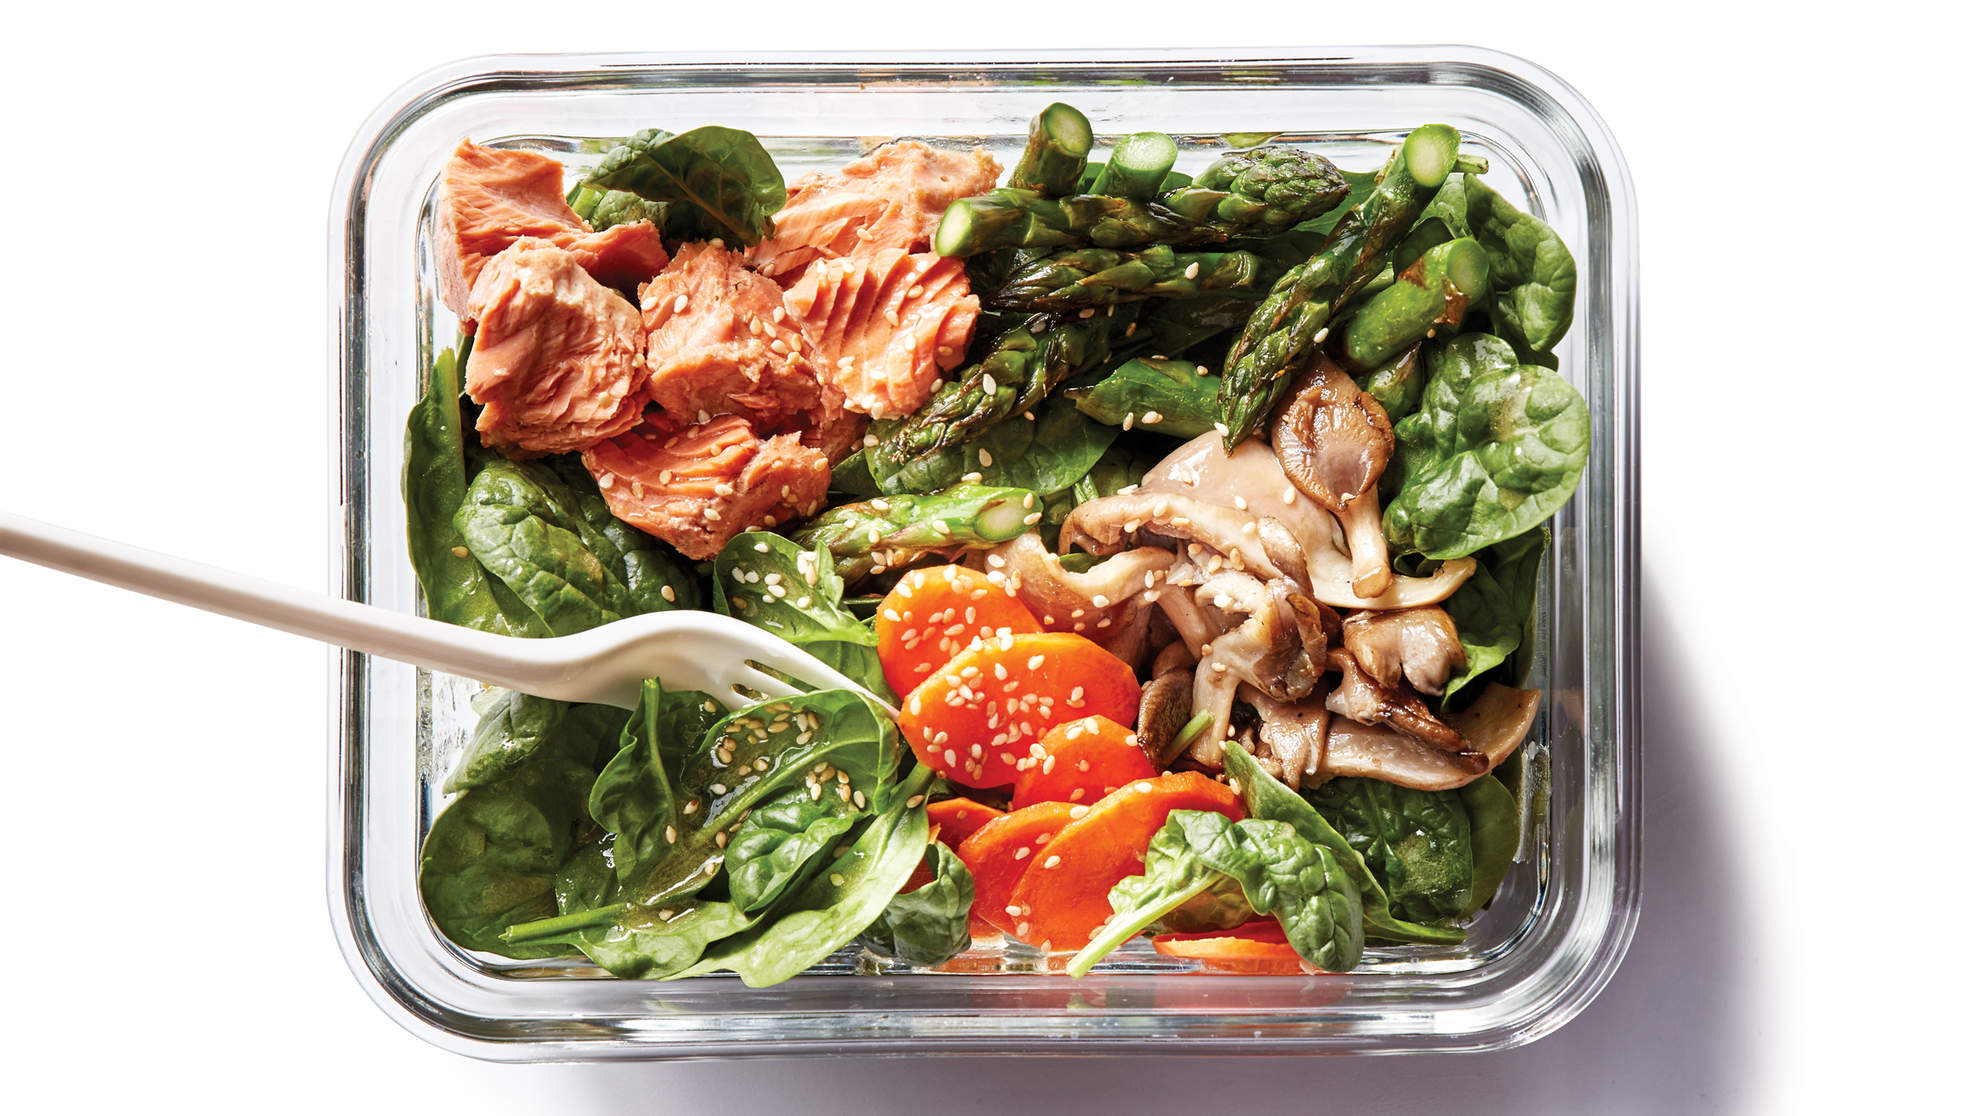 Spinach-Salmon Salad